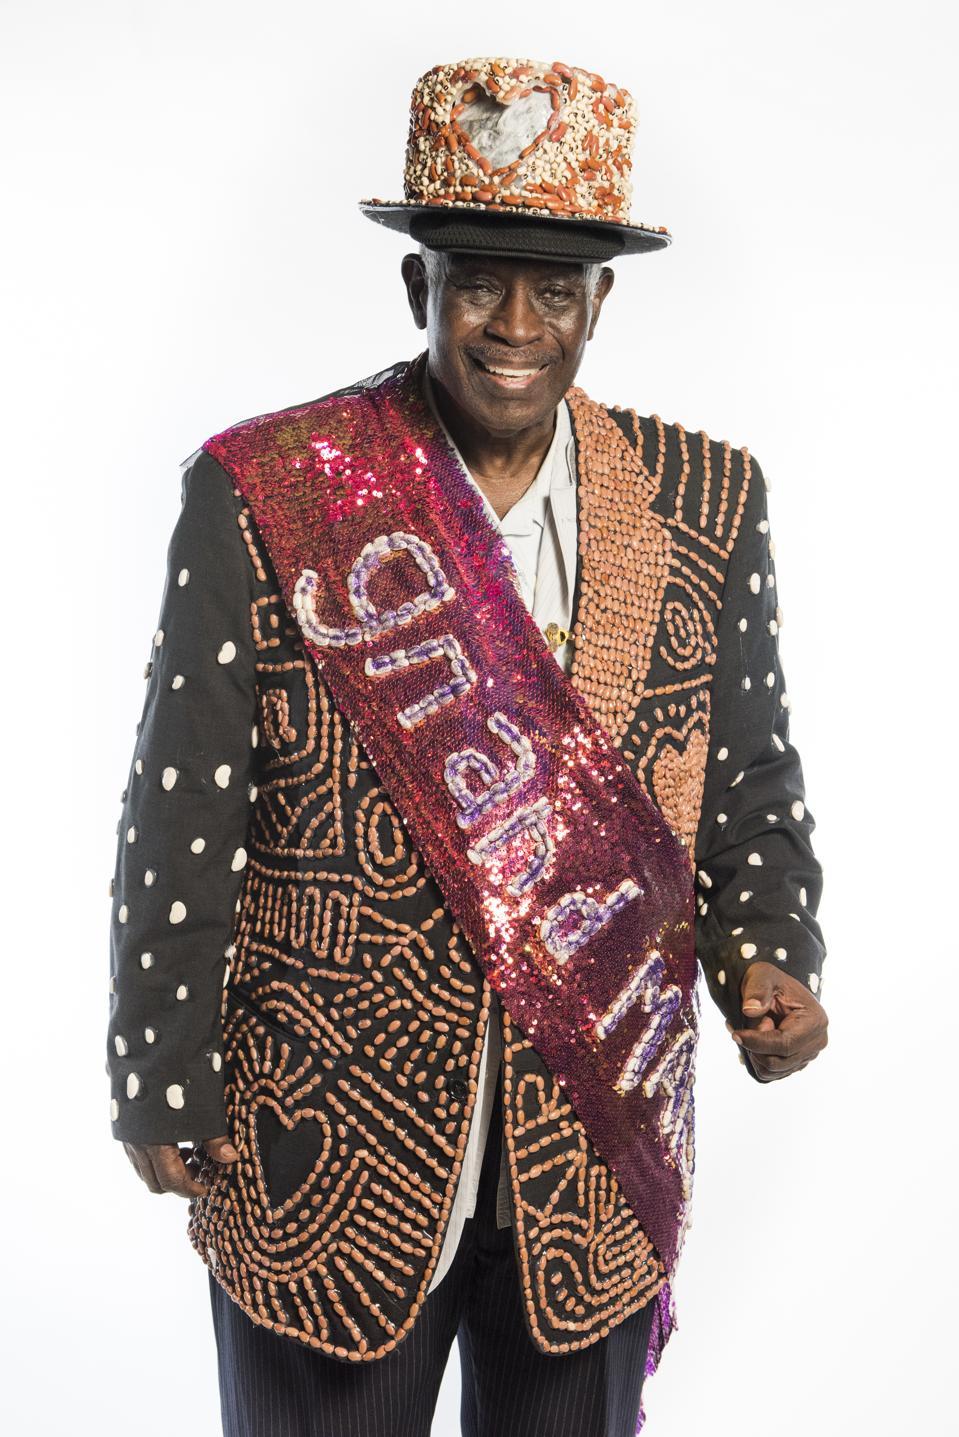 Krewe of Red Beans Grand Marshall,  Al ″Carnival Time″ Johnson